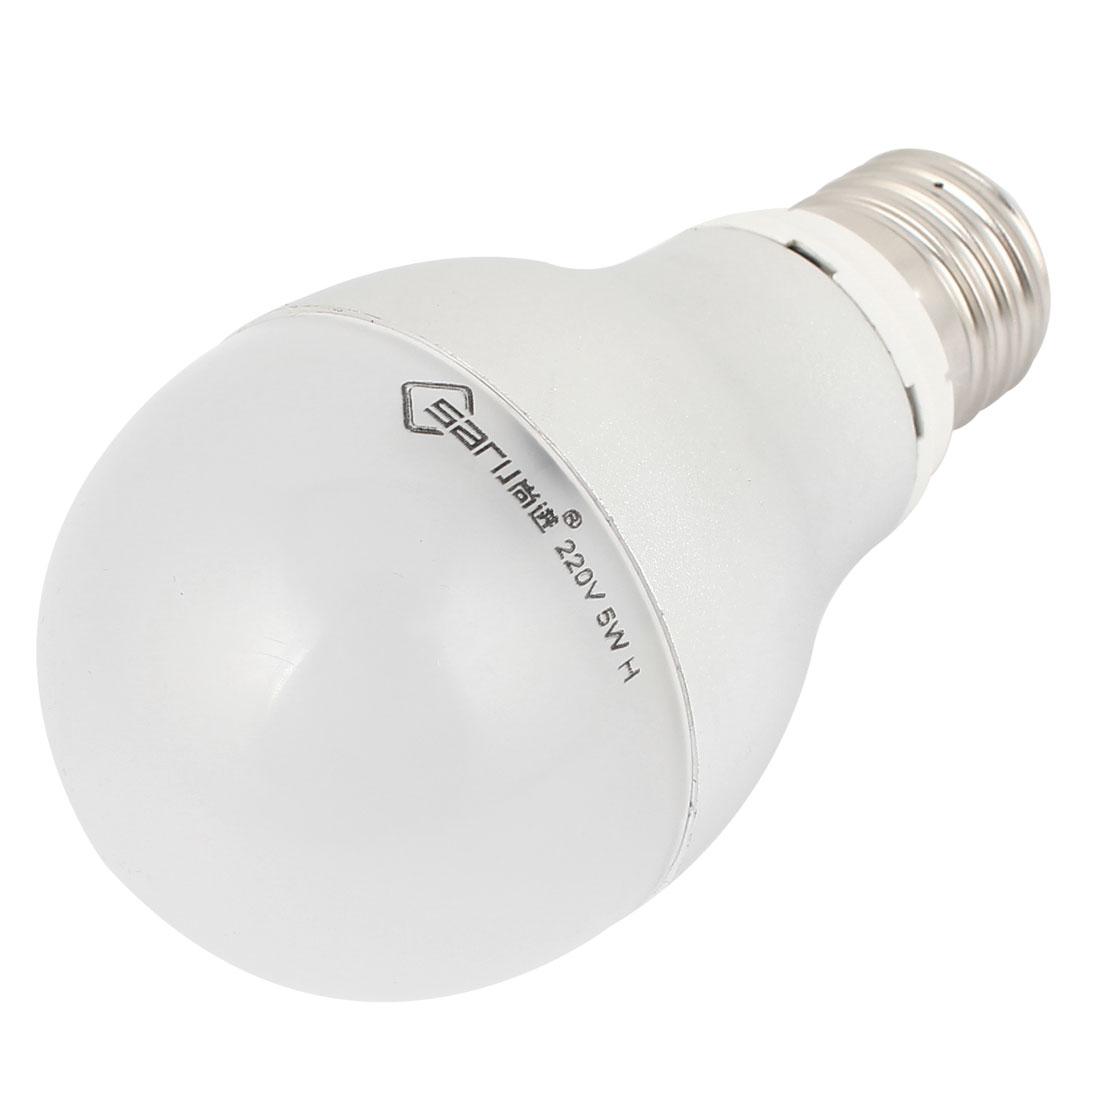 Home E26 Energy Saving LED Globe Ball Warm White Light Lamp Bulb AC 220V 5W